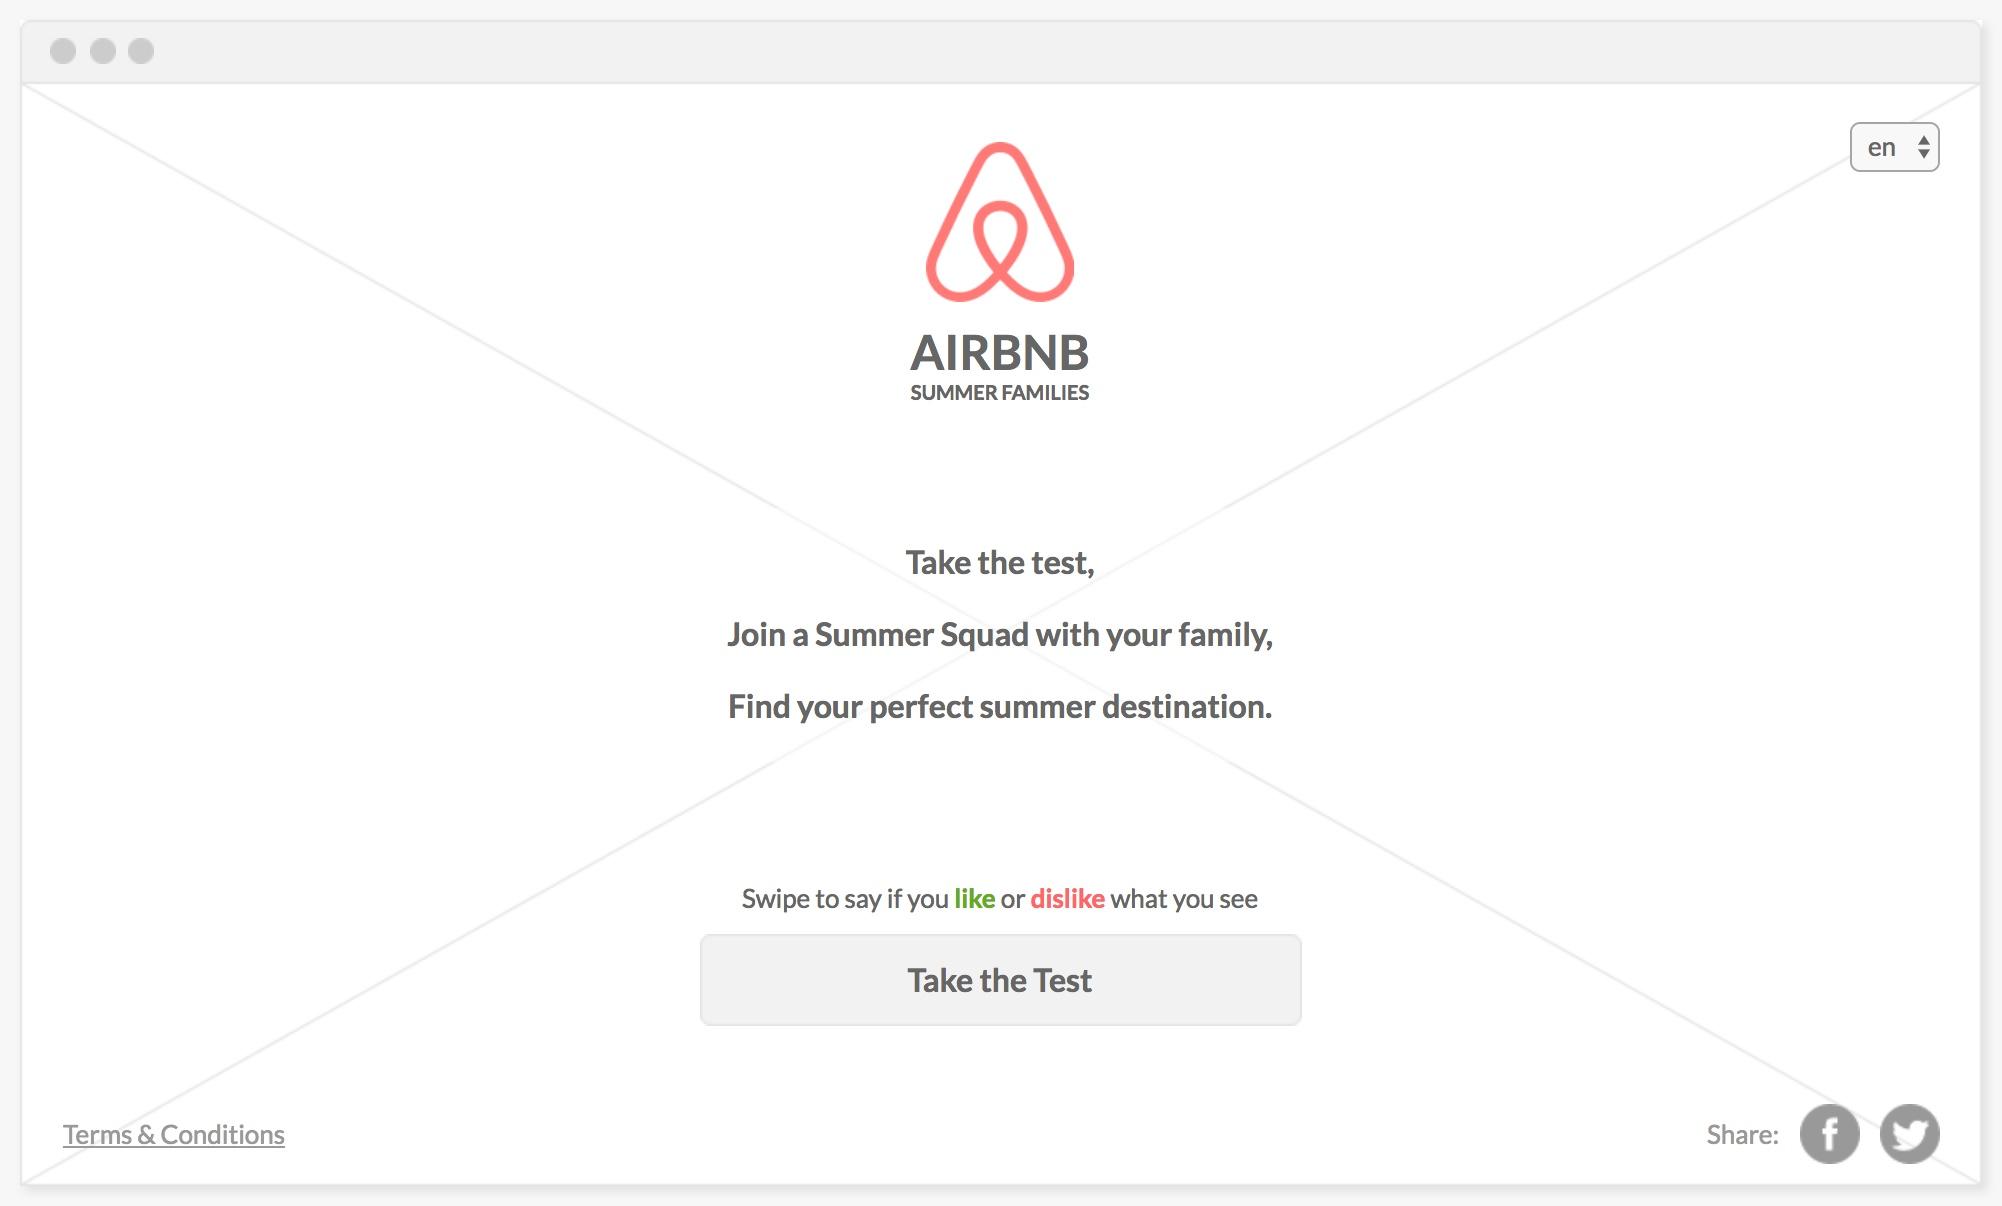 airbnb7—desktop